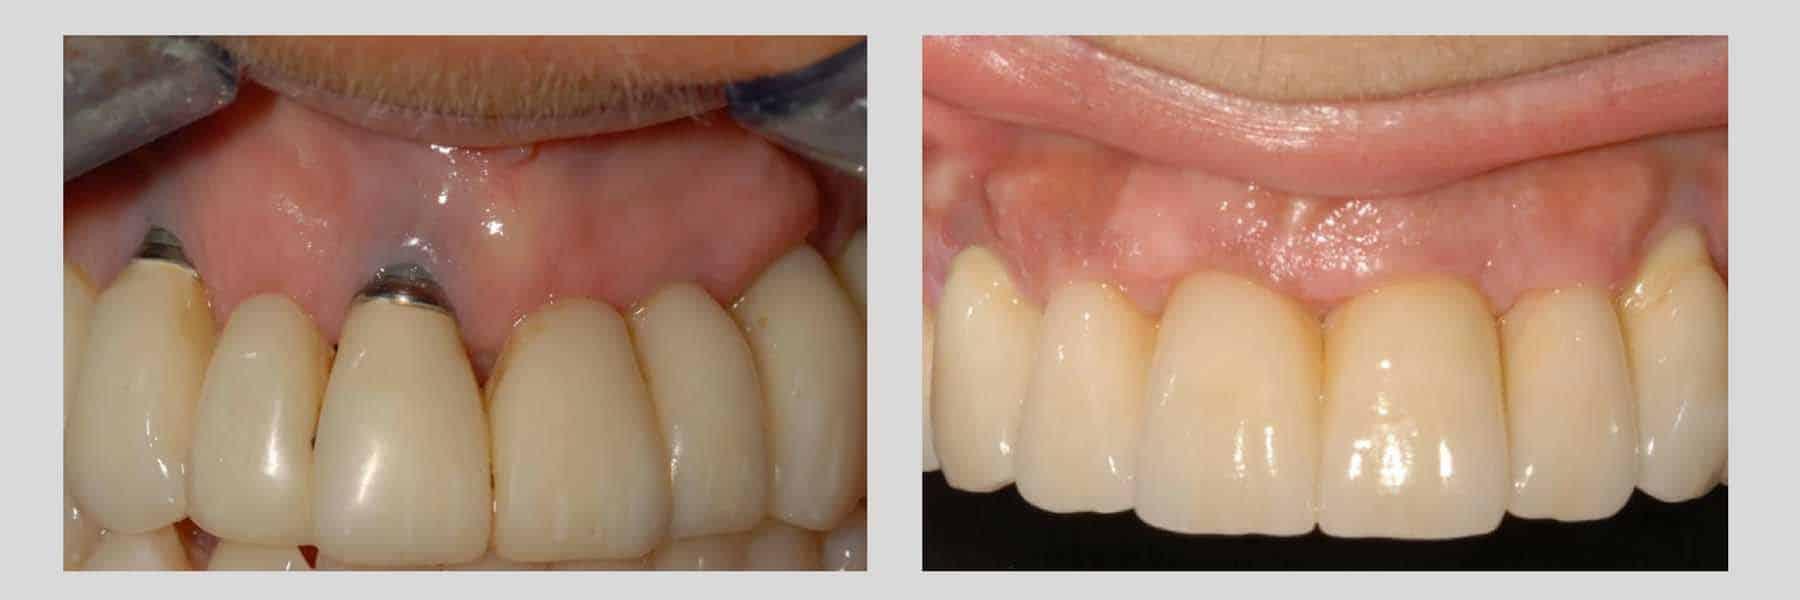 innesto gengivale su impianto dentale